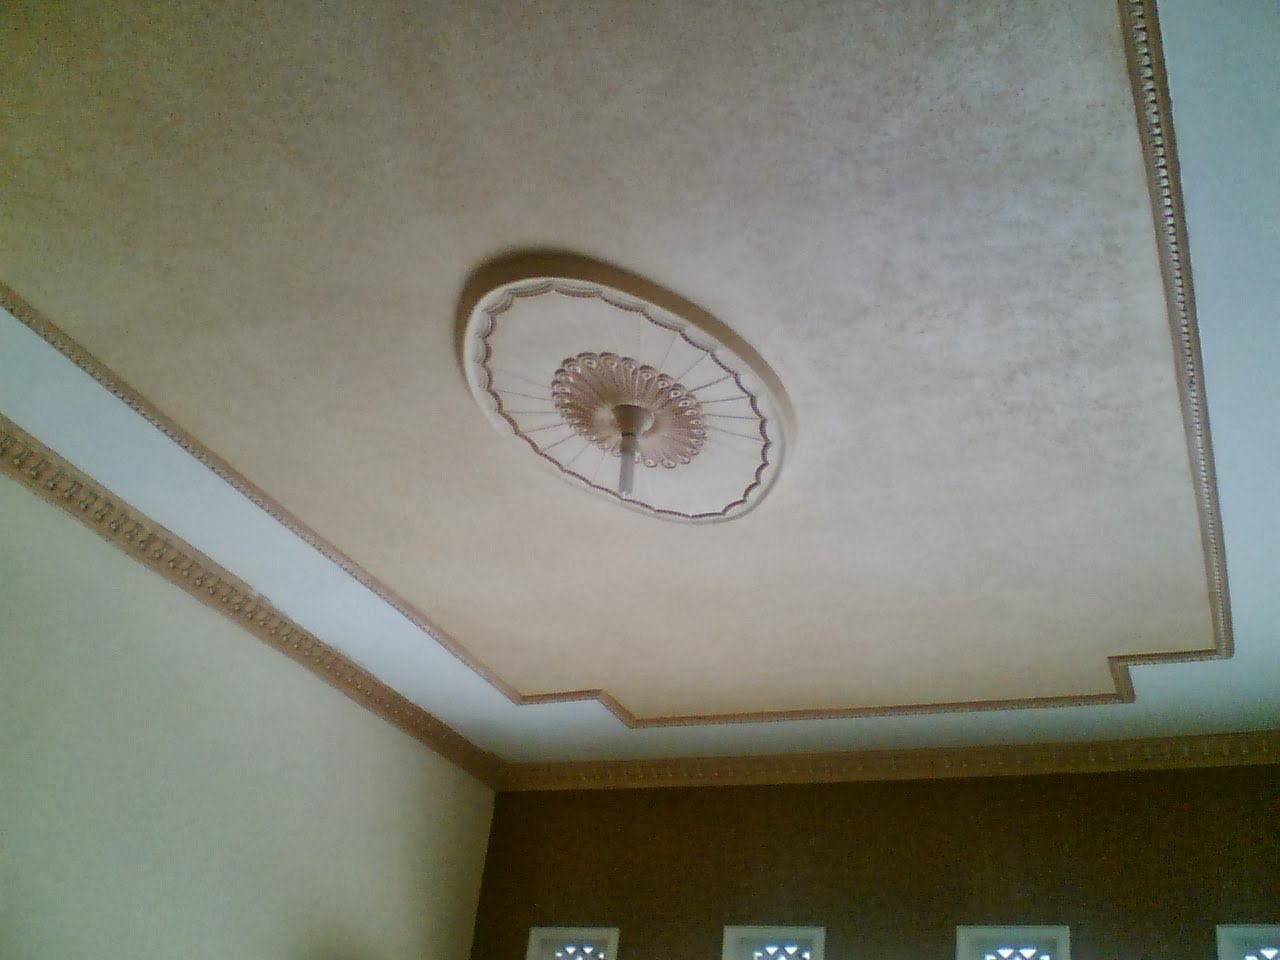 Rangka Plafon Baja Ringan Minimalis Harga Tukang Pasang Plafond Gypsum,partisi Gypsum,lis ...